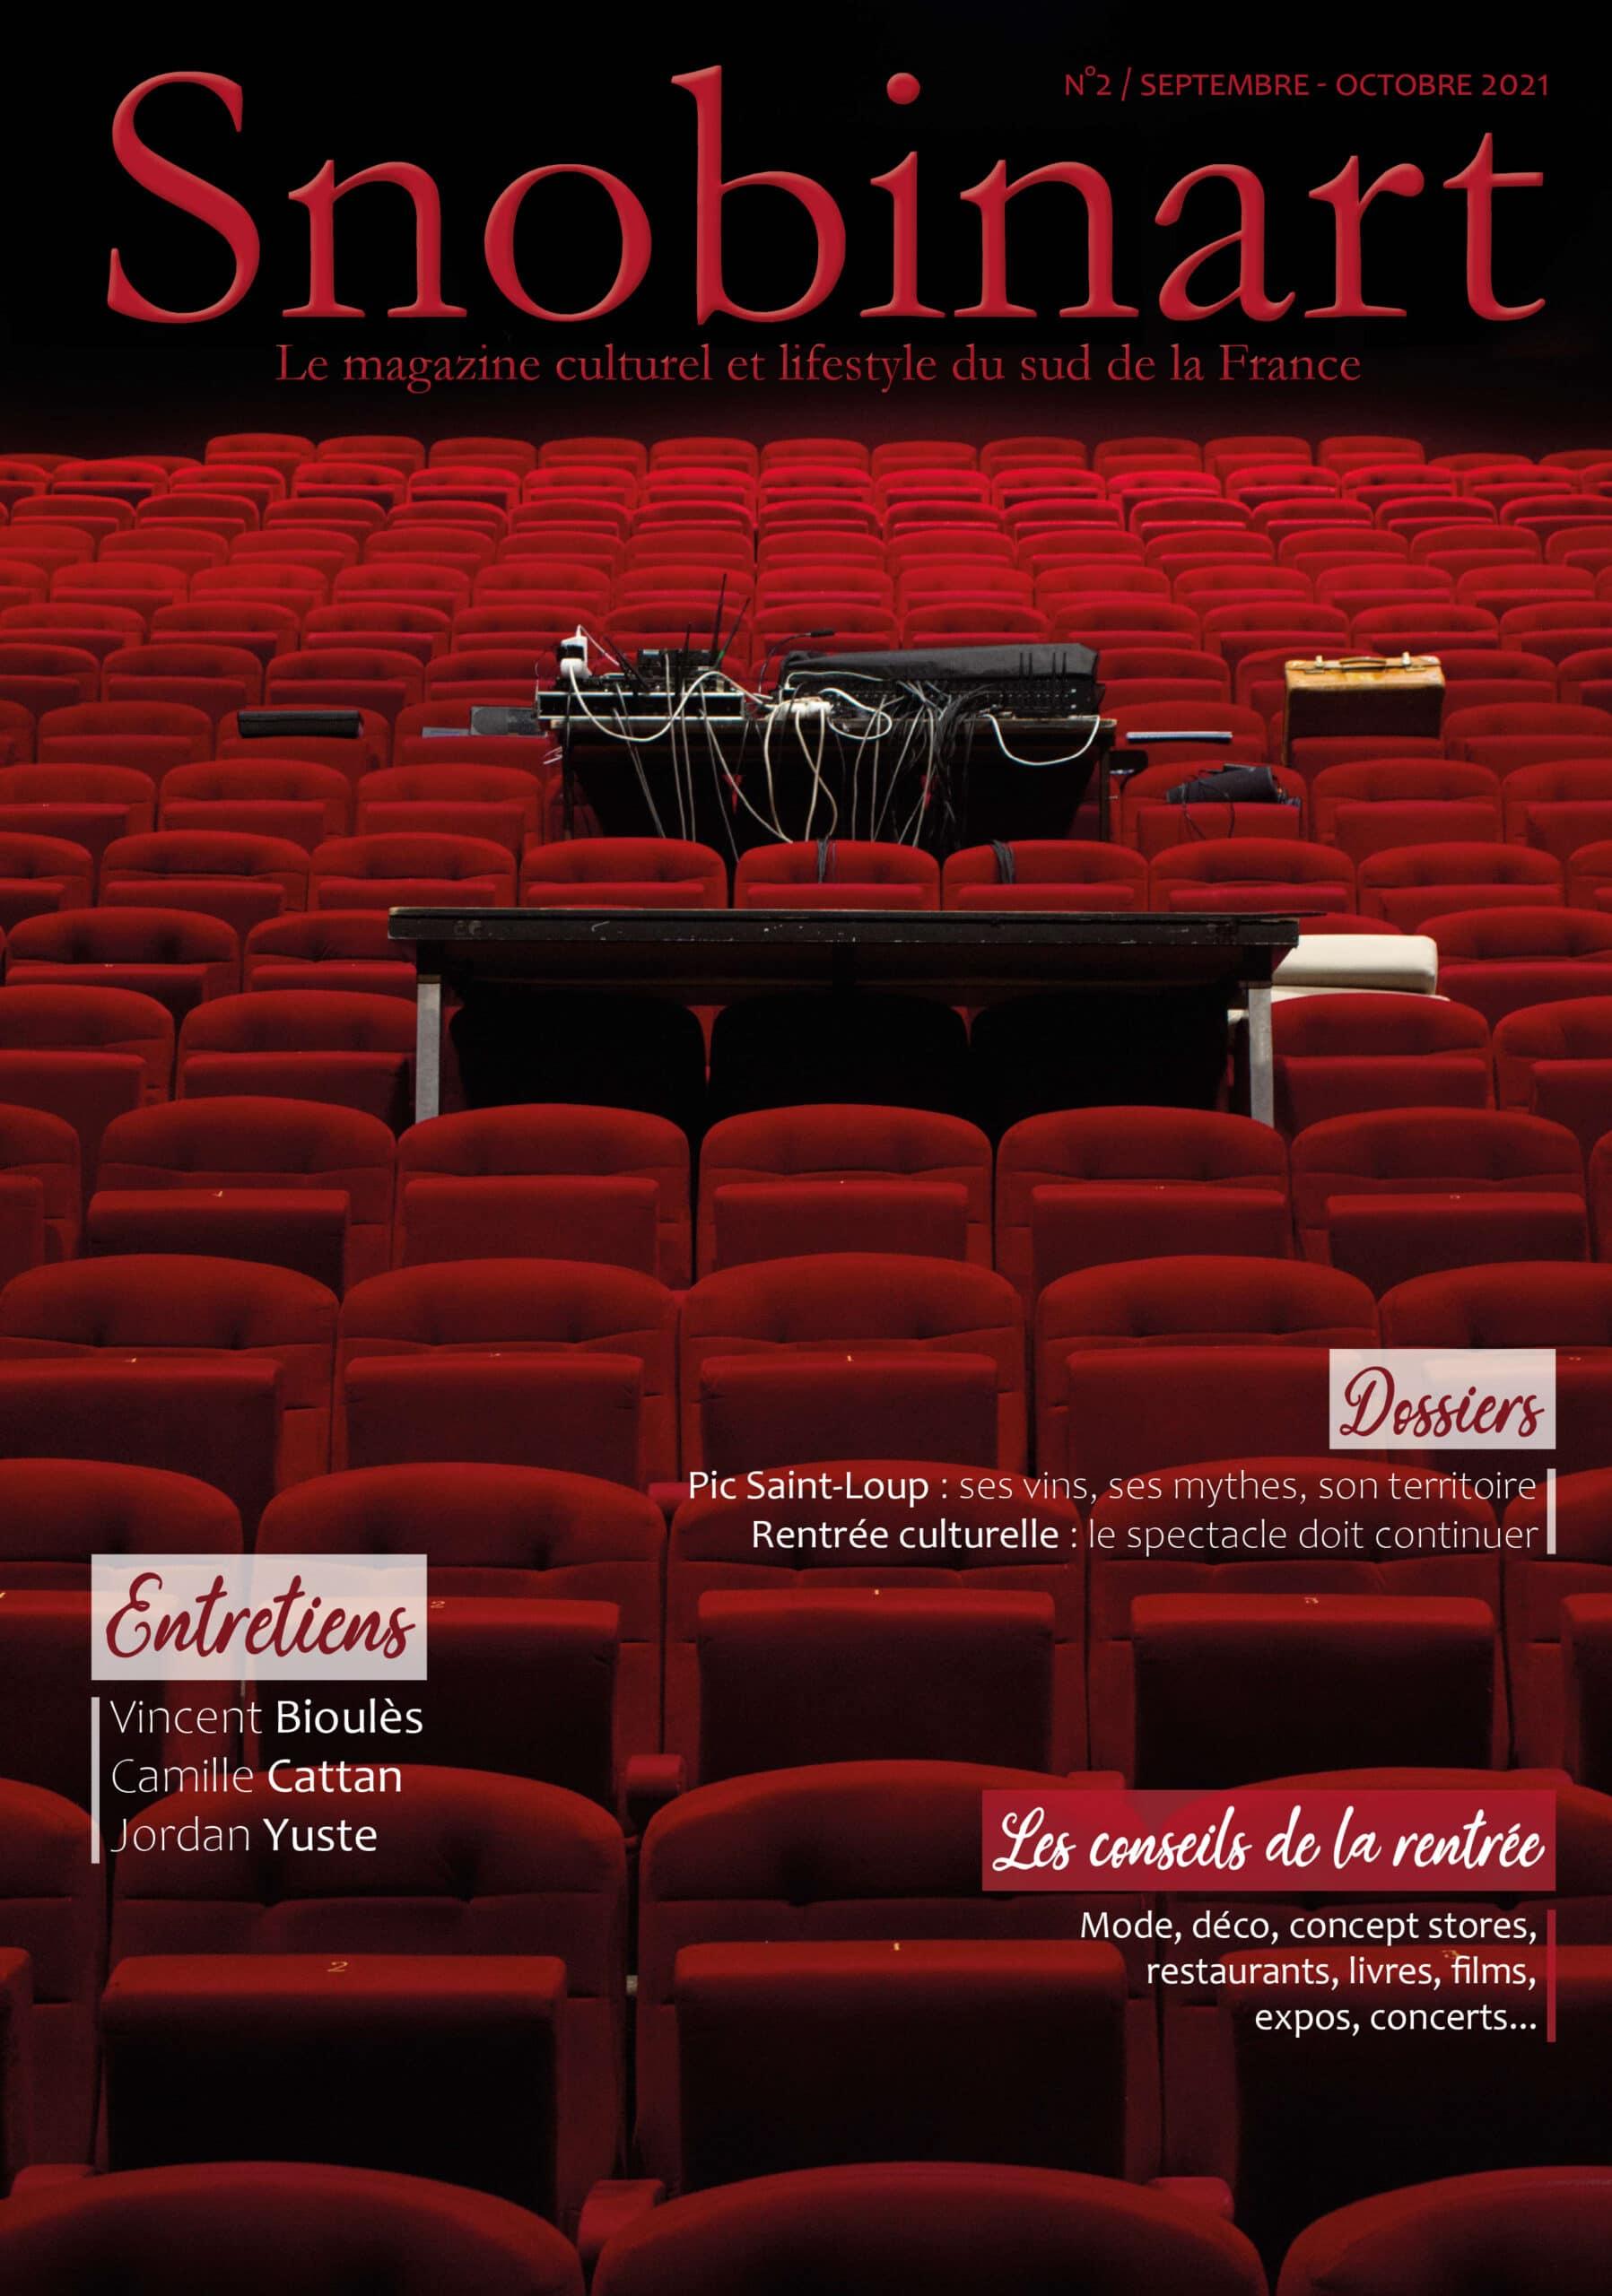 Couverture Magazine Snobinart N°2 Septembre Octobre 2021